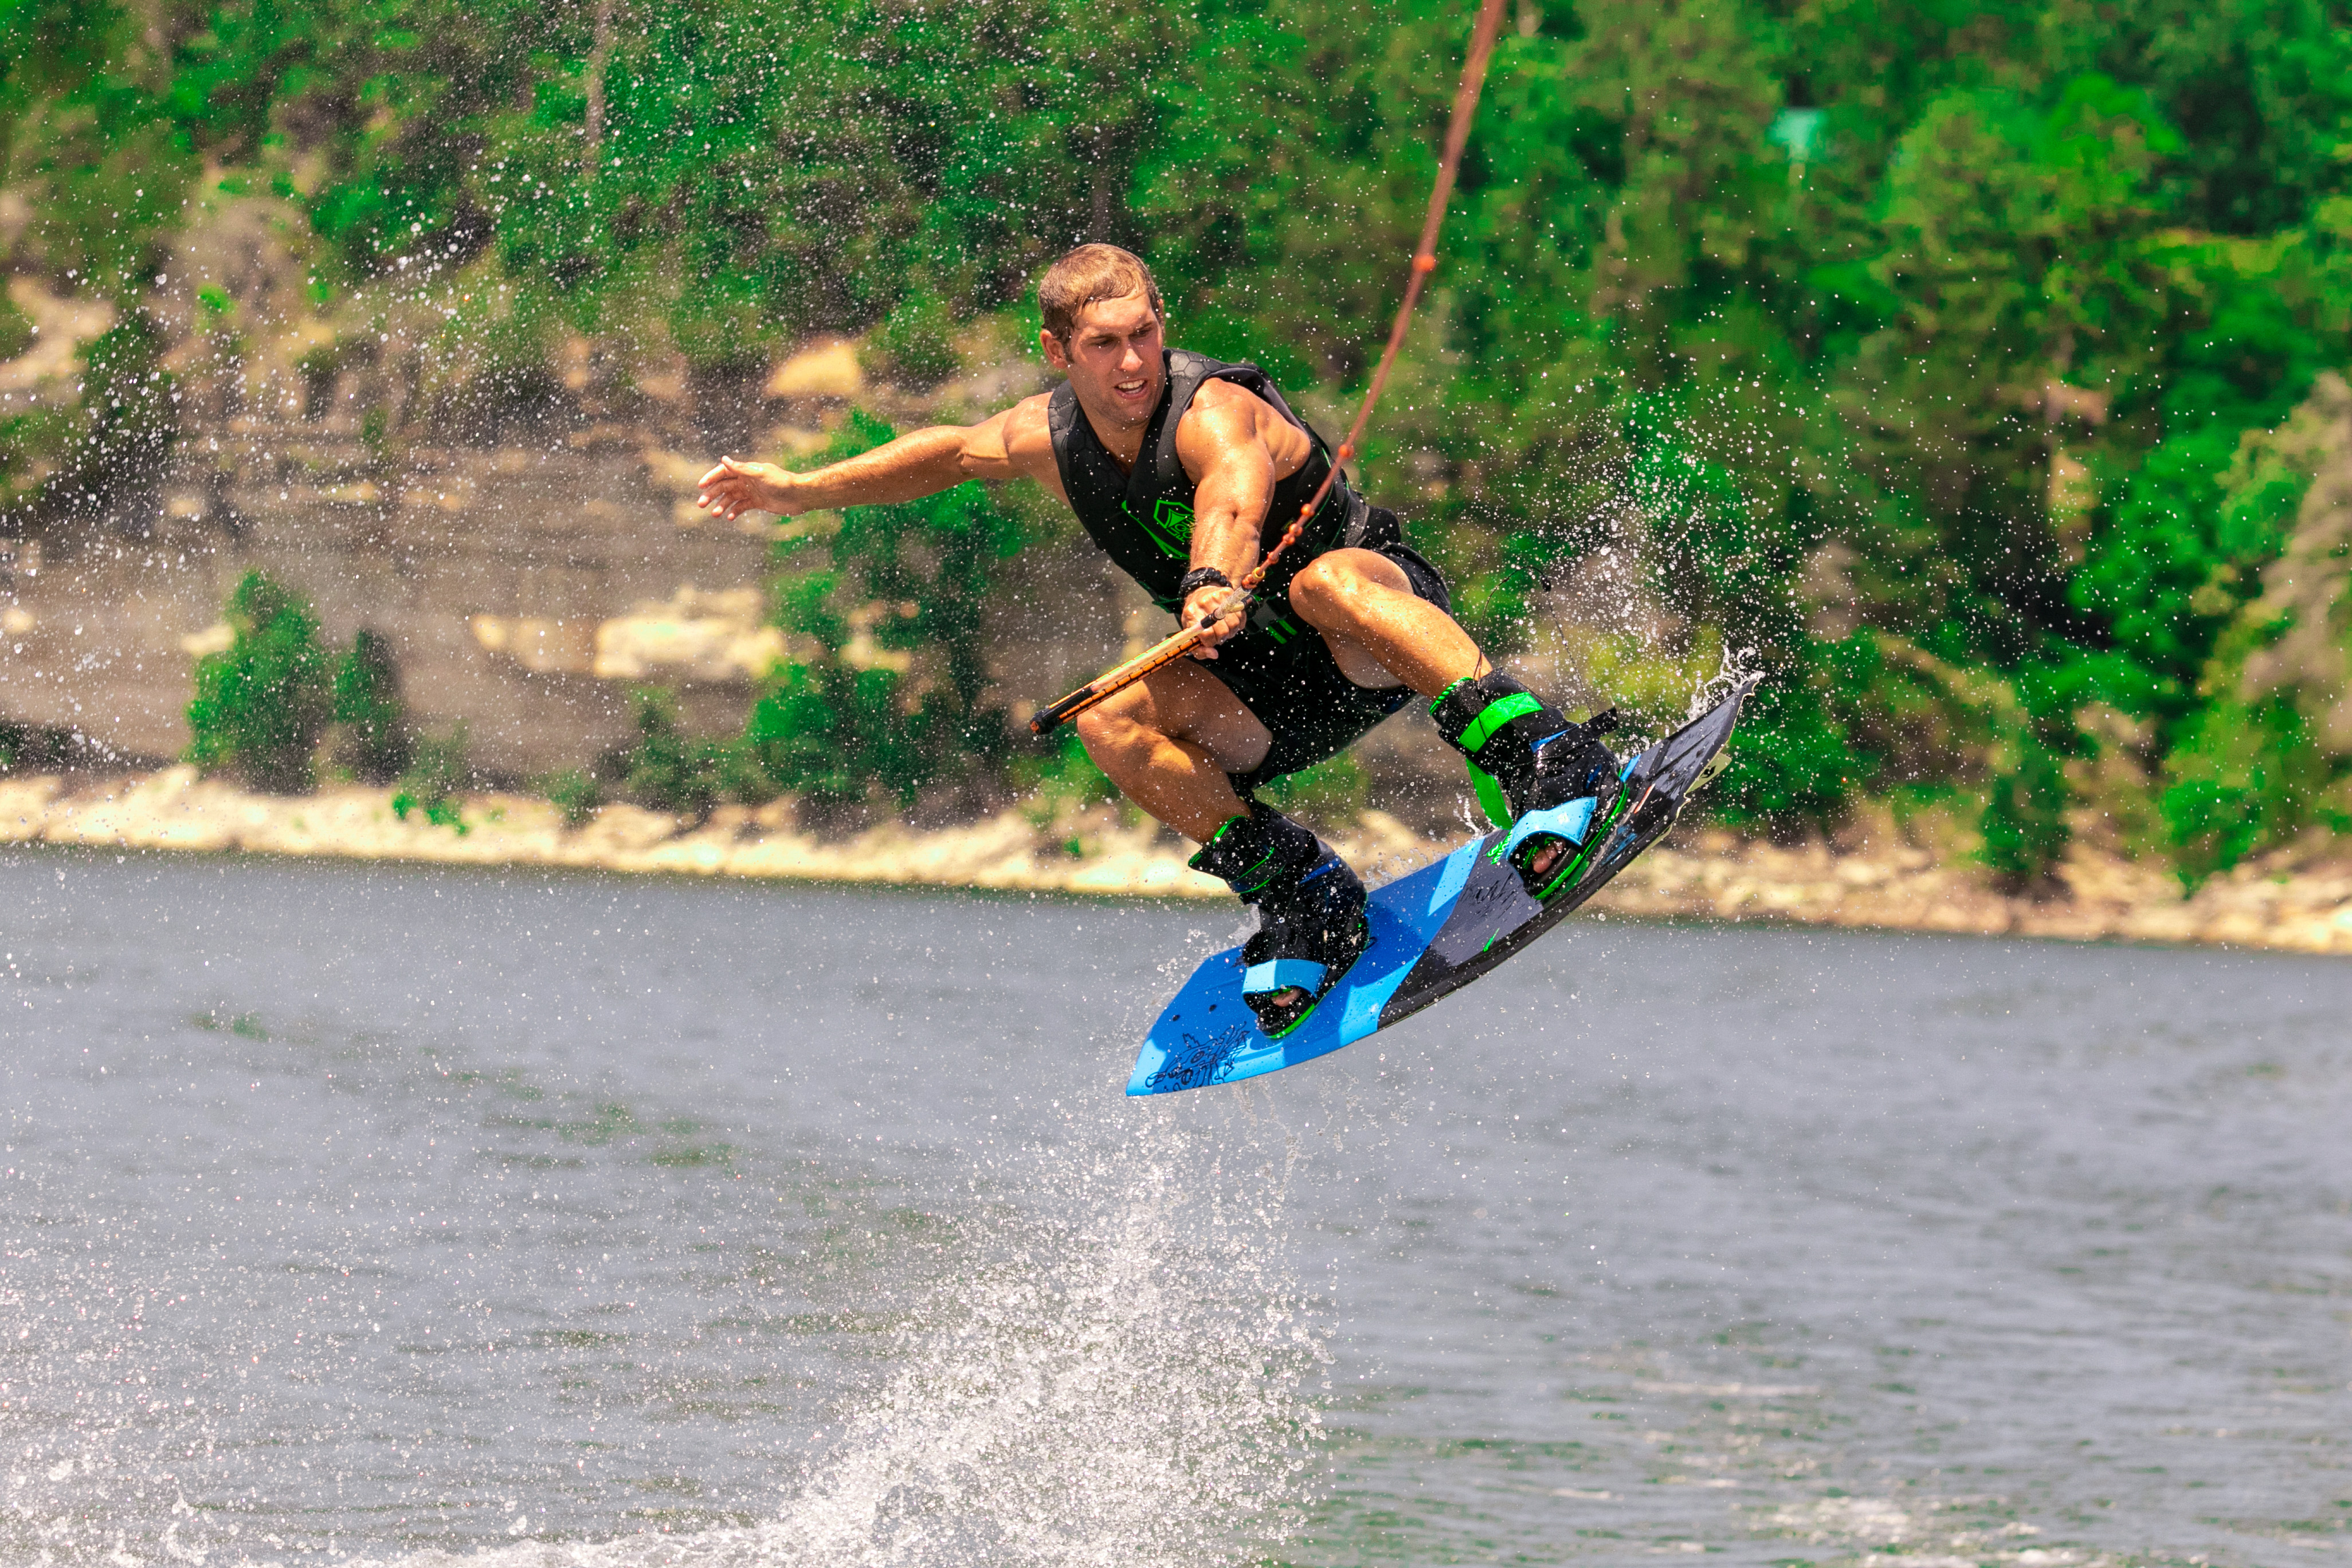 X-Treme Water Sports